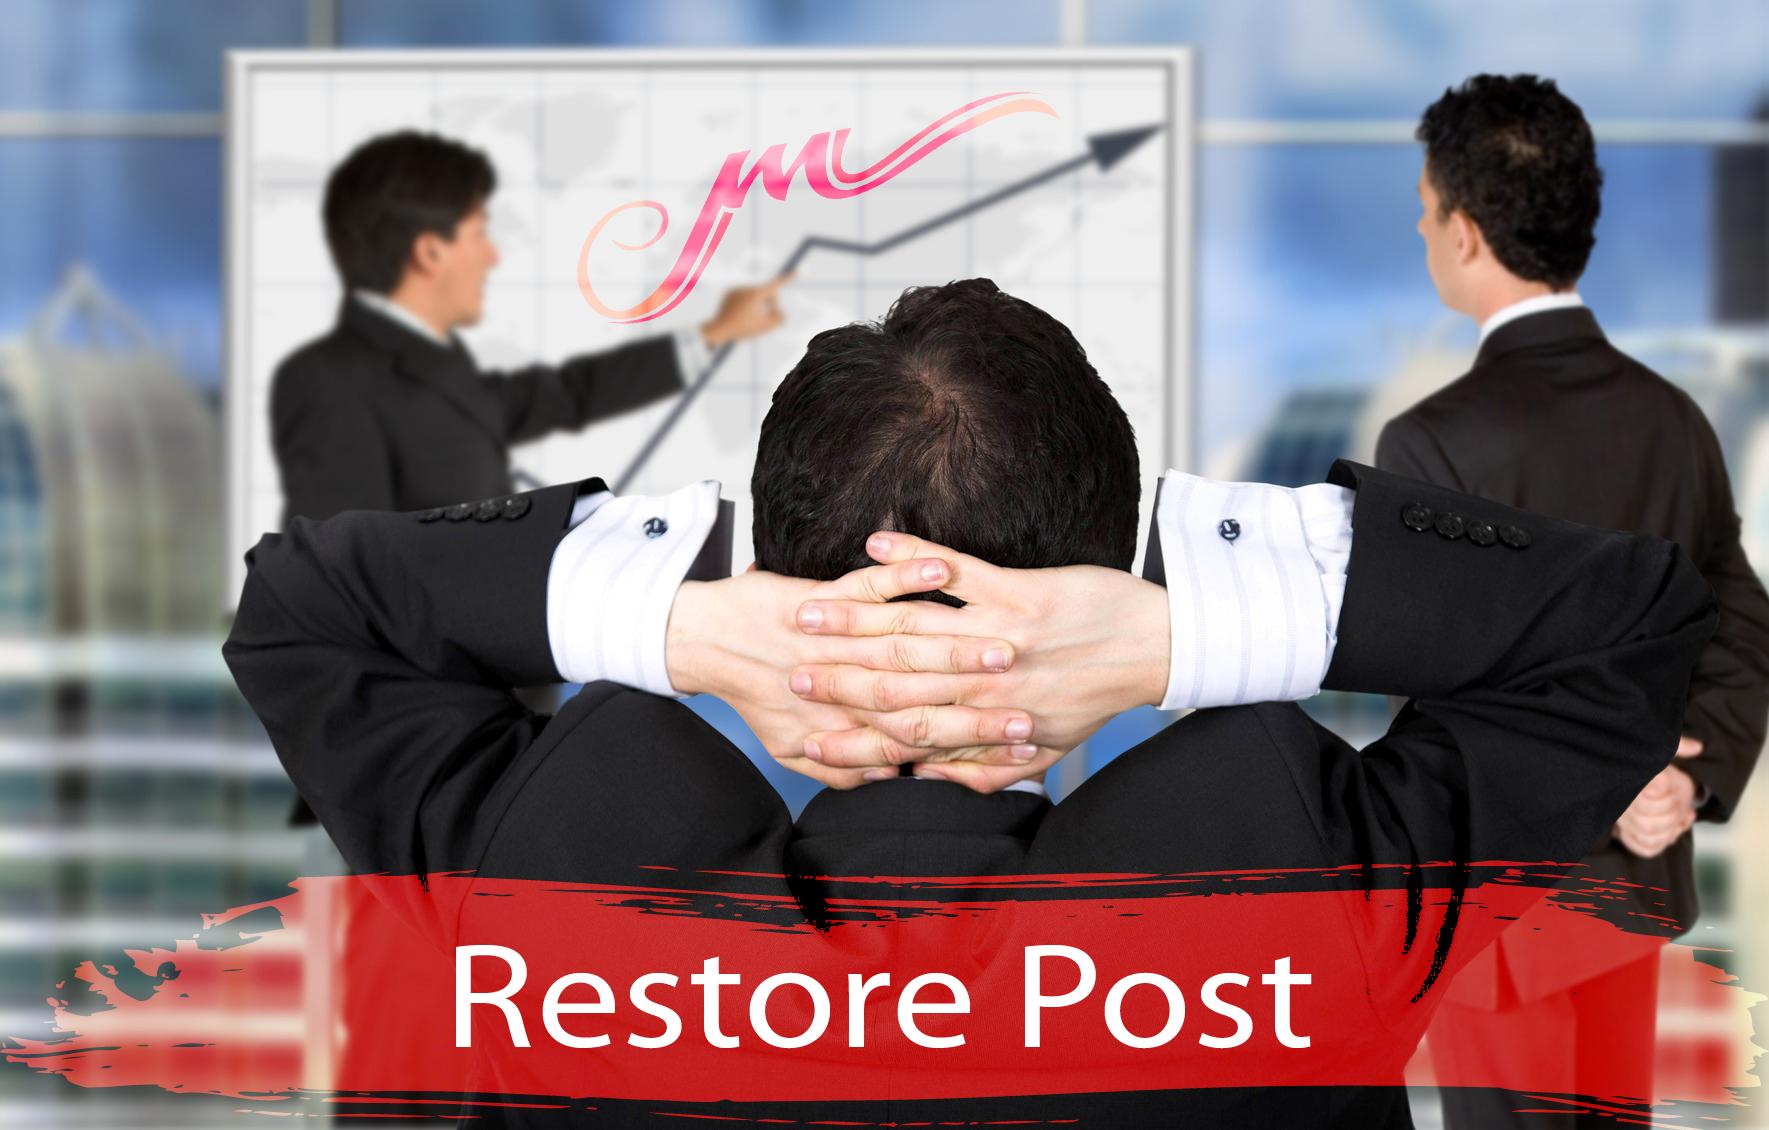 Restore Post